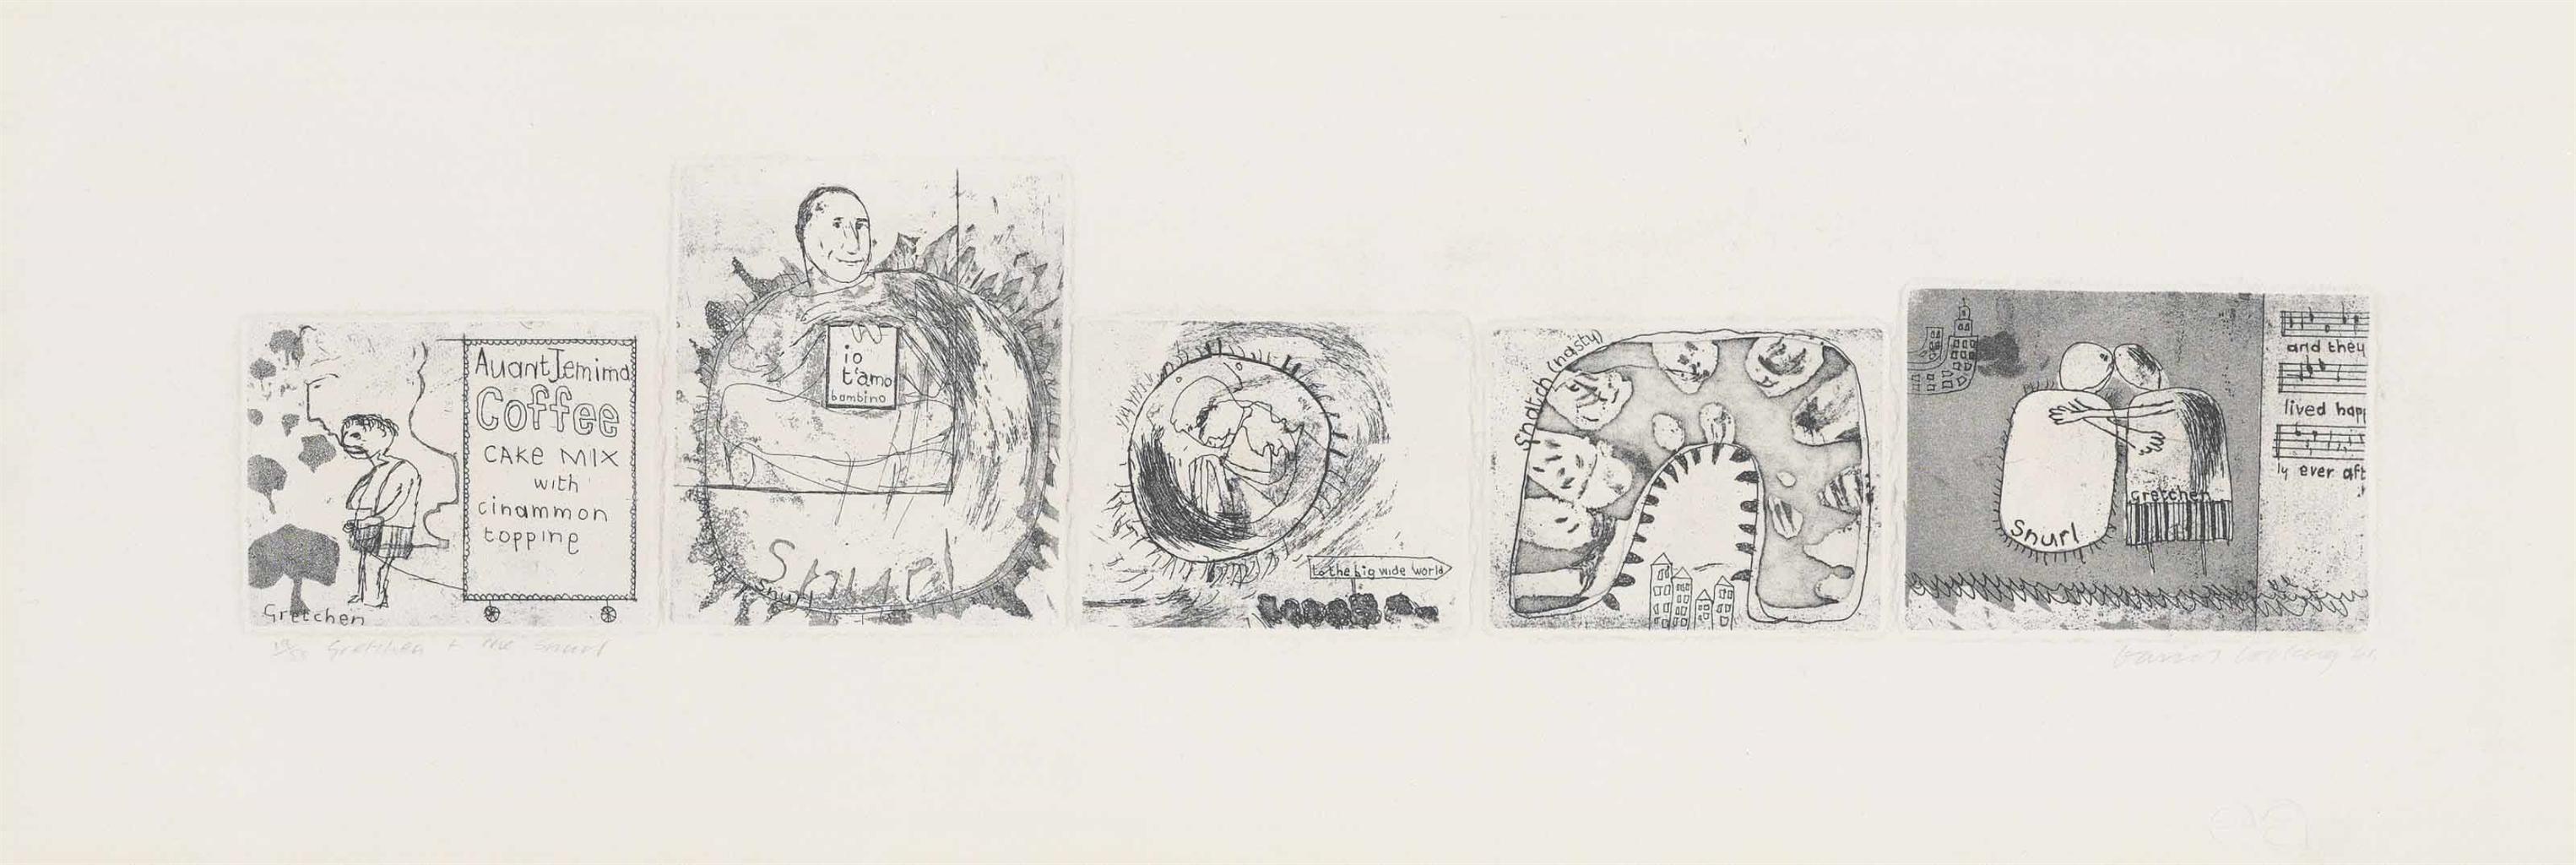 David Hockney-Gretchen and the Snurl-1961